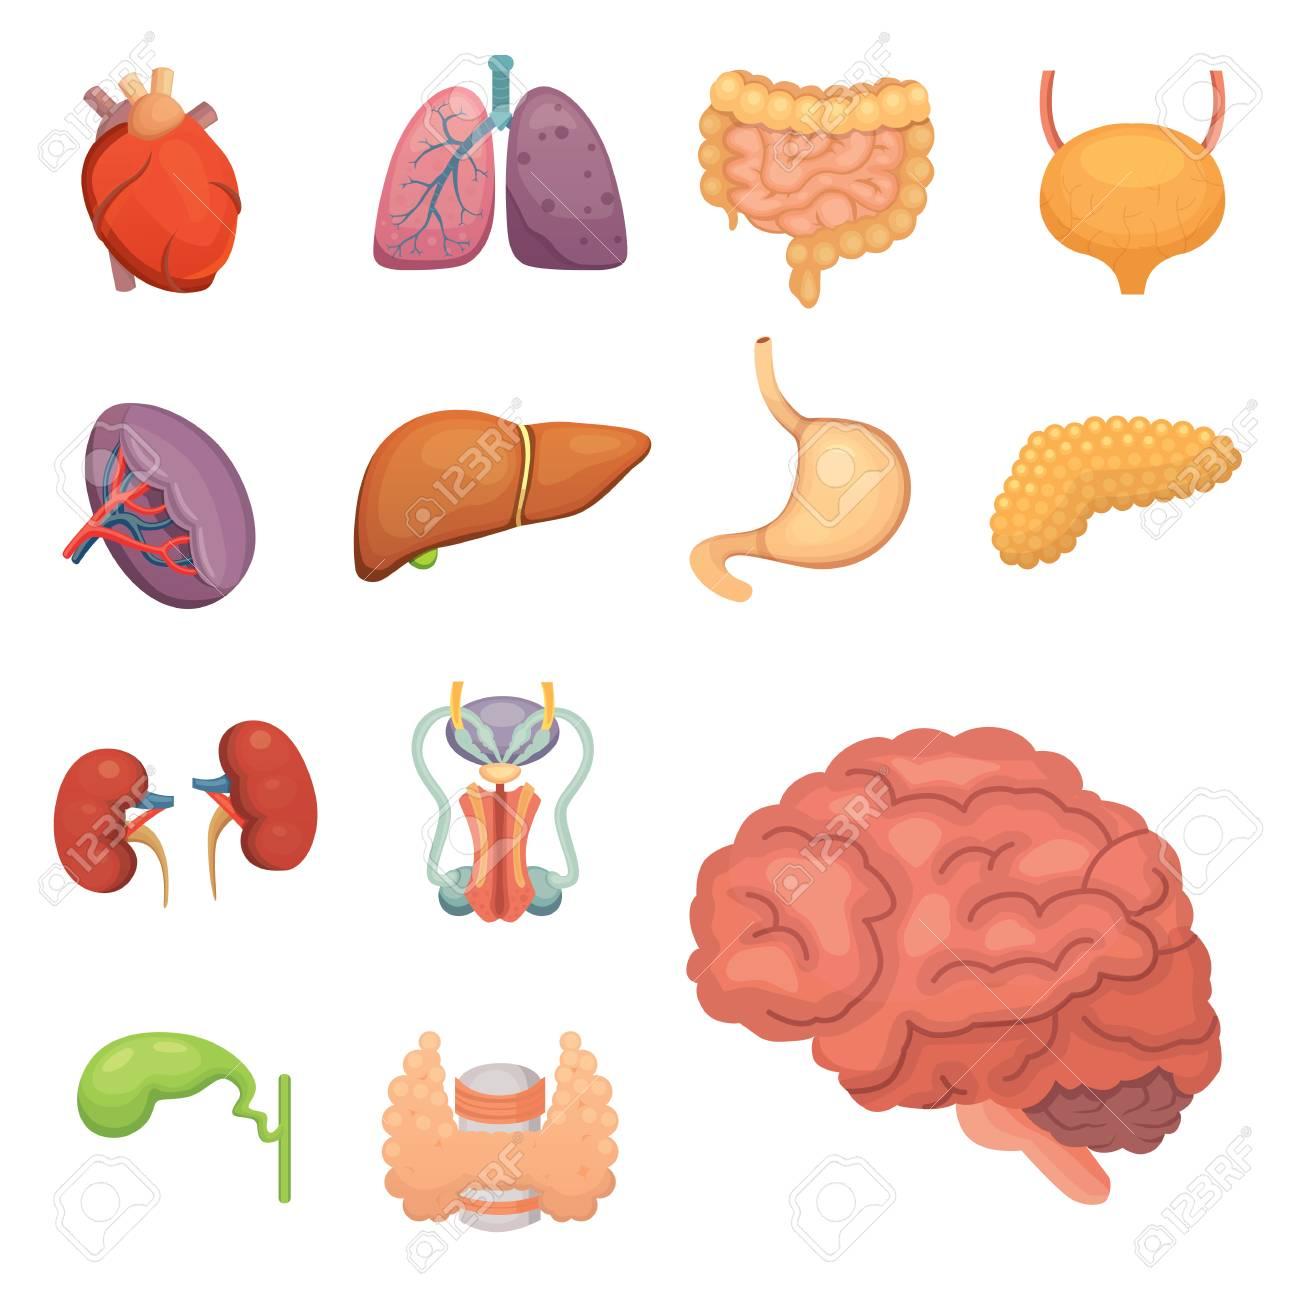 Cartoon Human Organs Set. Anatomy Of Body. Reproductive System ...